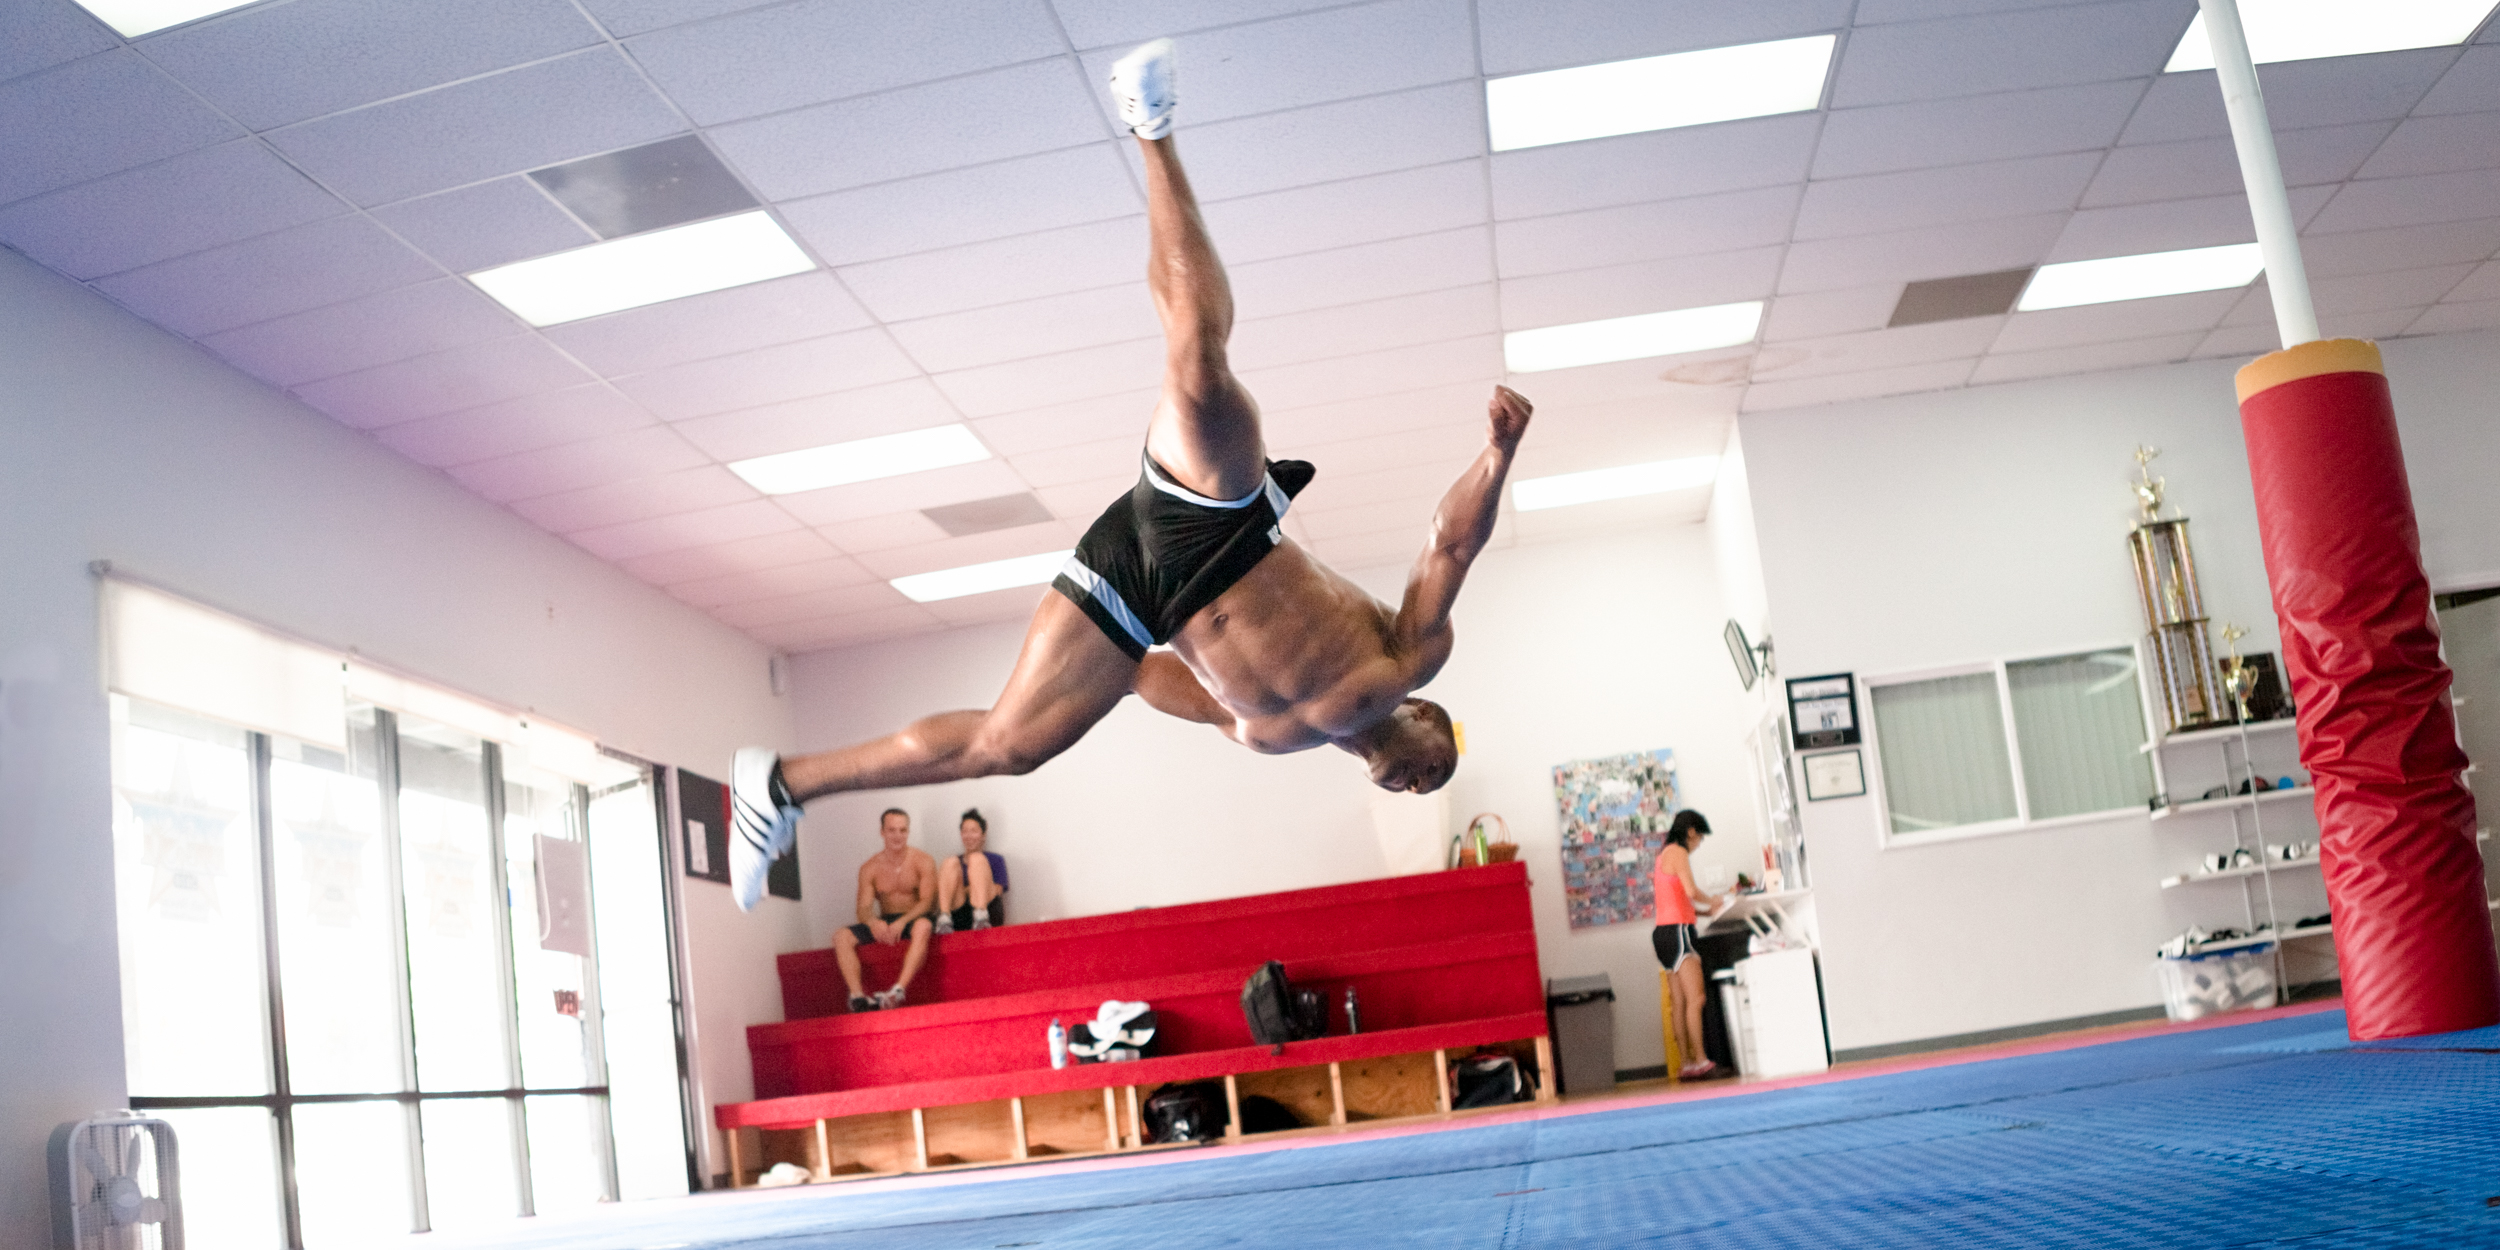 The Tae Kwon Do Olympian